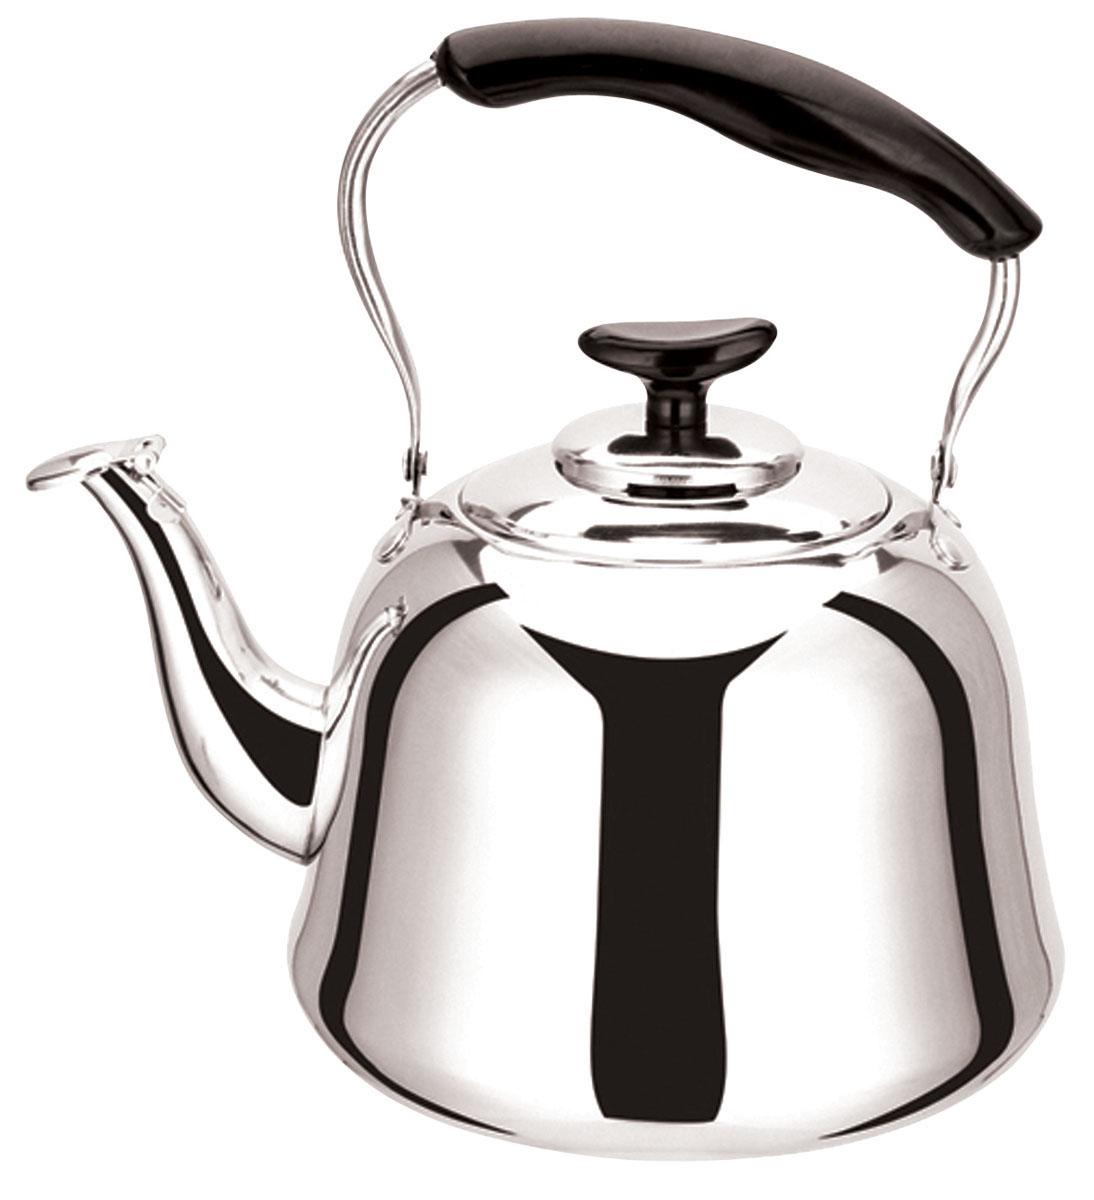 Чайник Bekker Koch со свистком, 4 л. BK-S478 термос bekker koch с помпой 2 5 л bk 4033